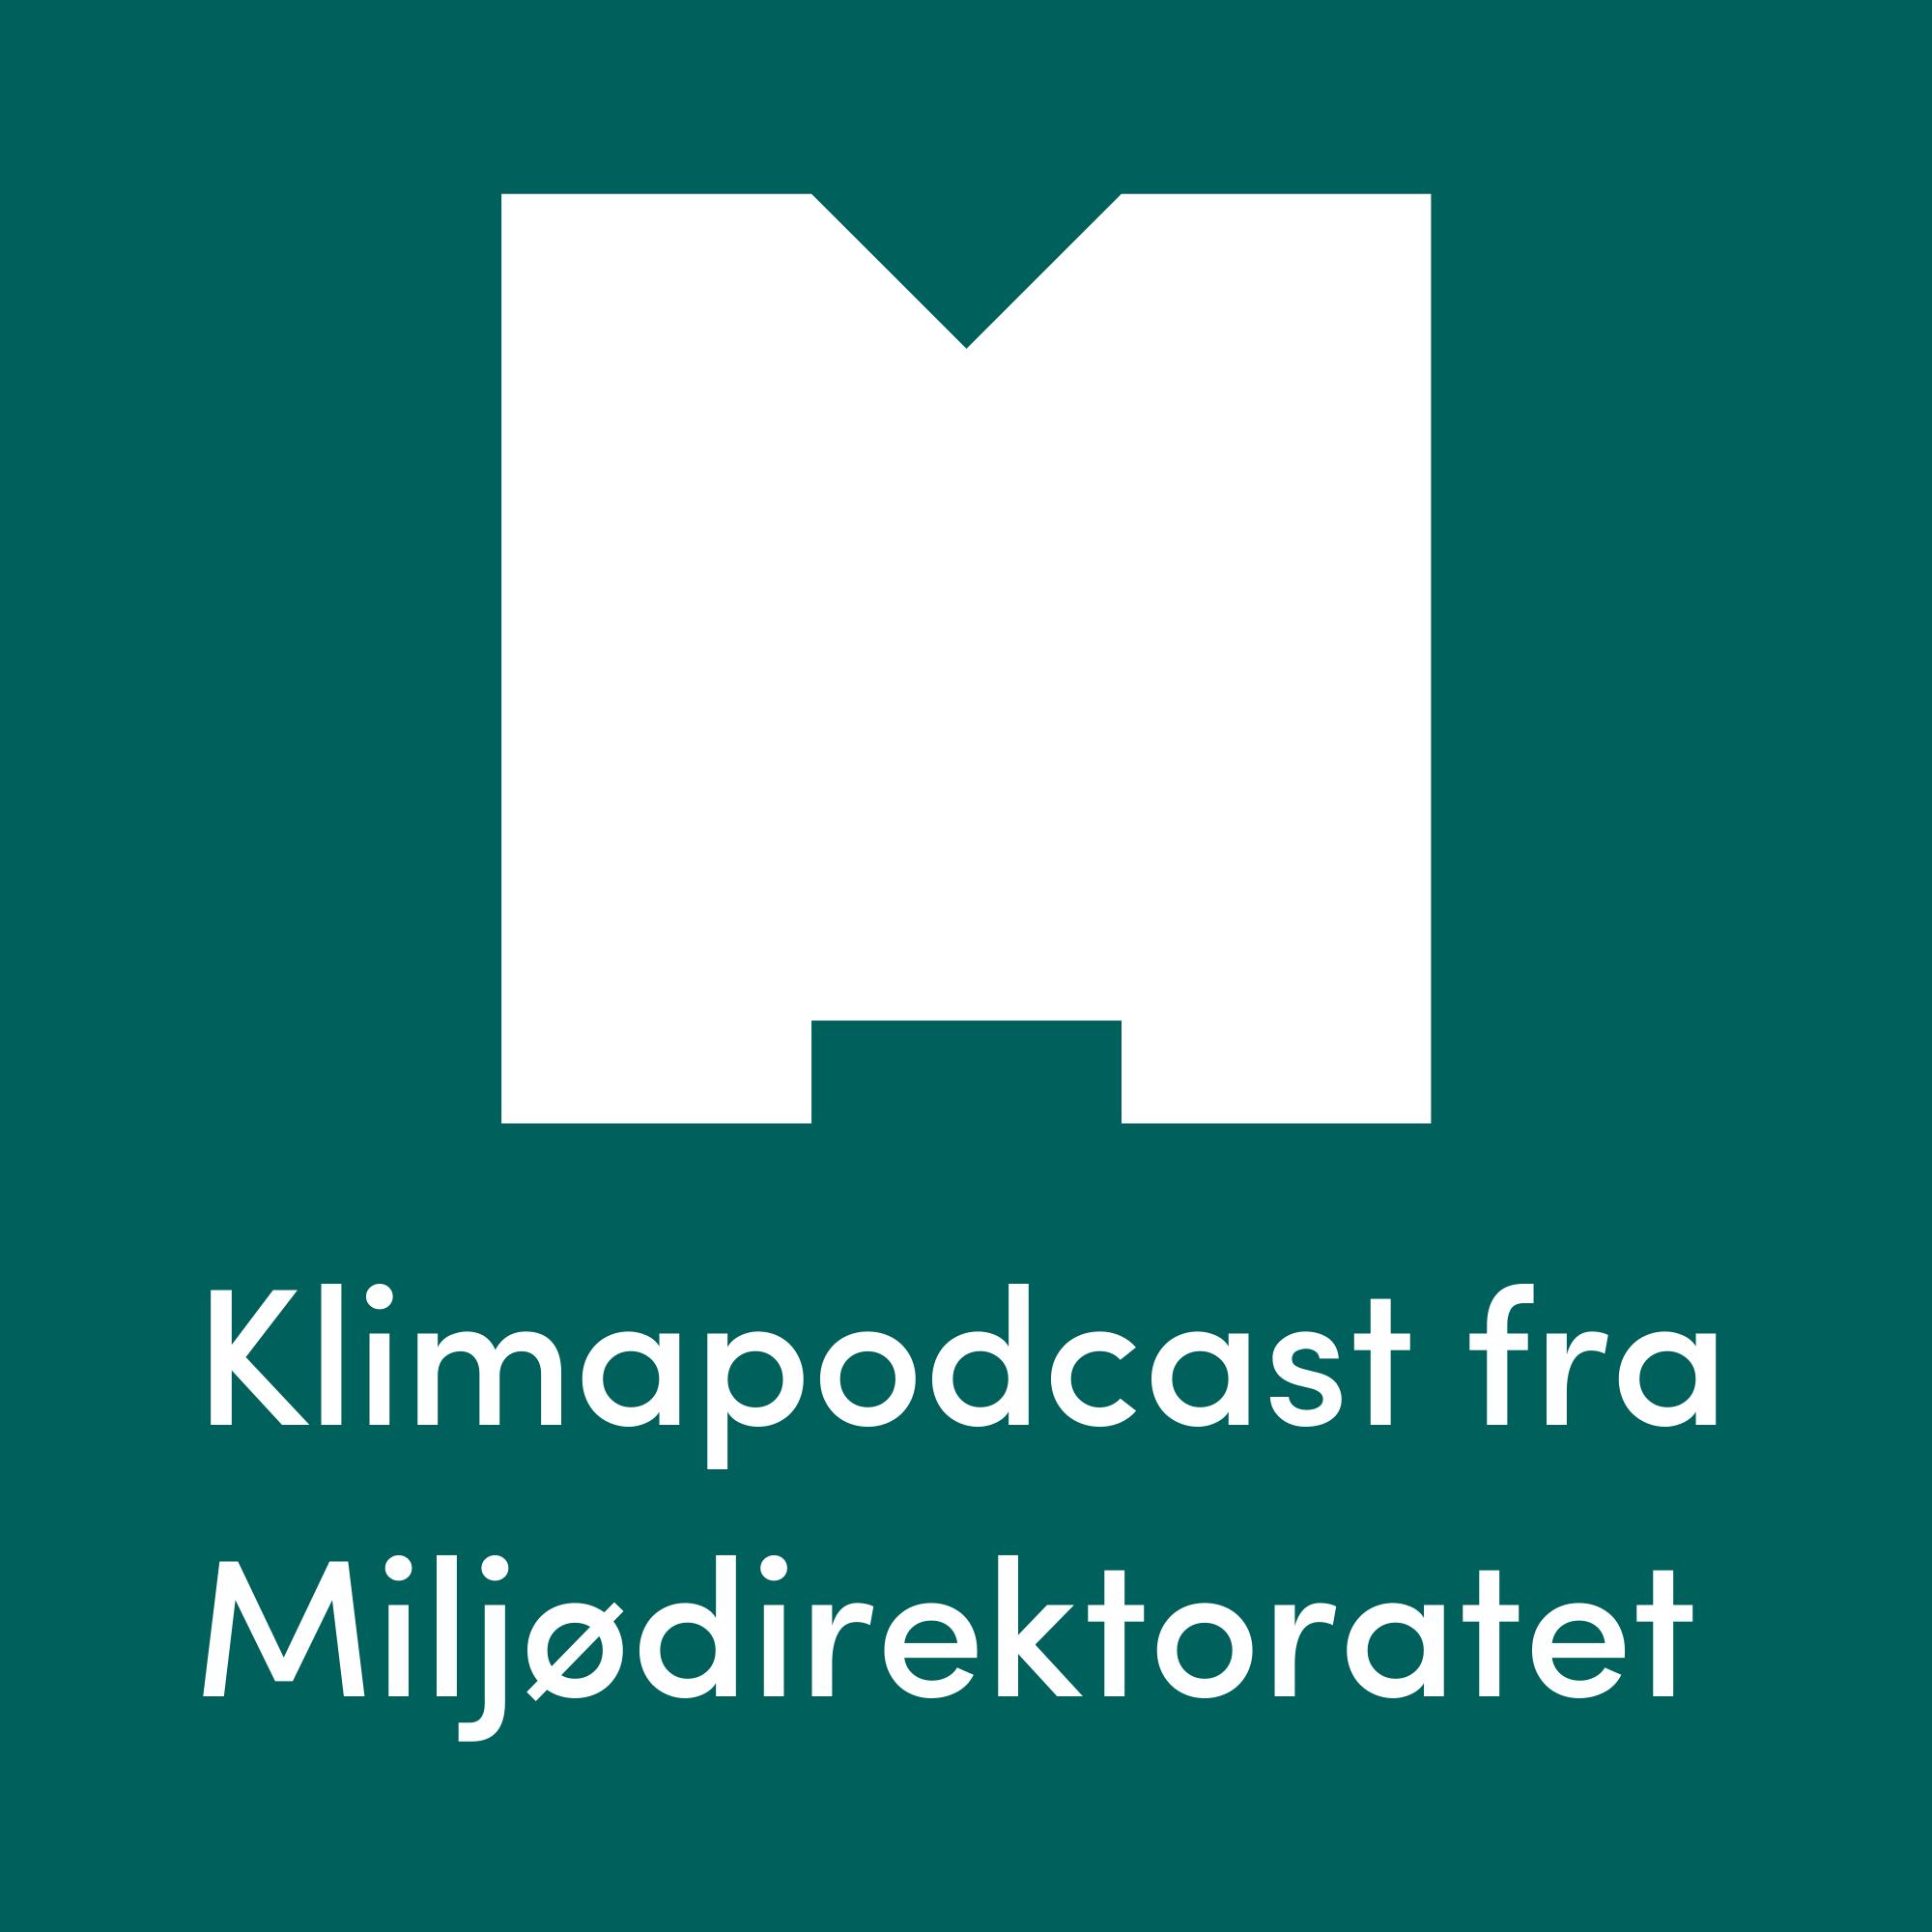 Klimapodcast fra Miljødirektoratet show art